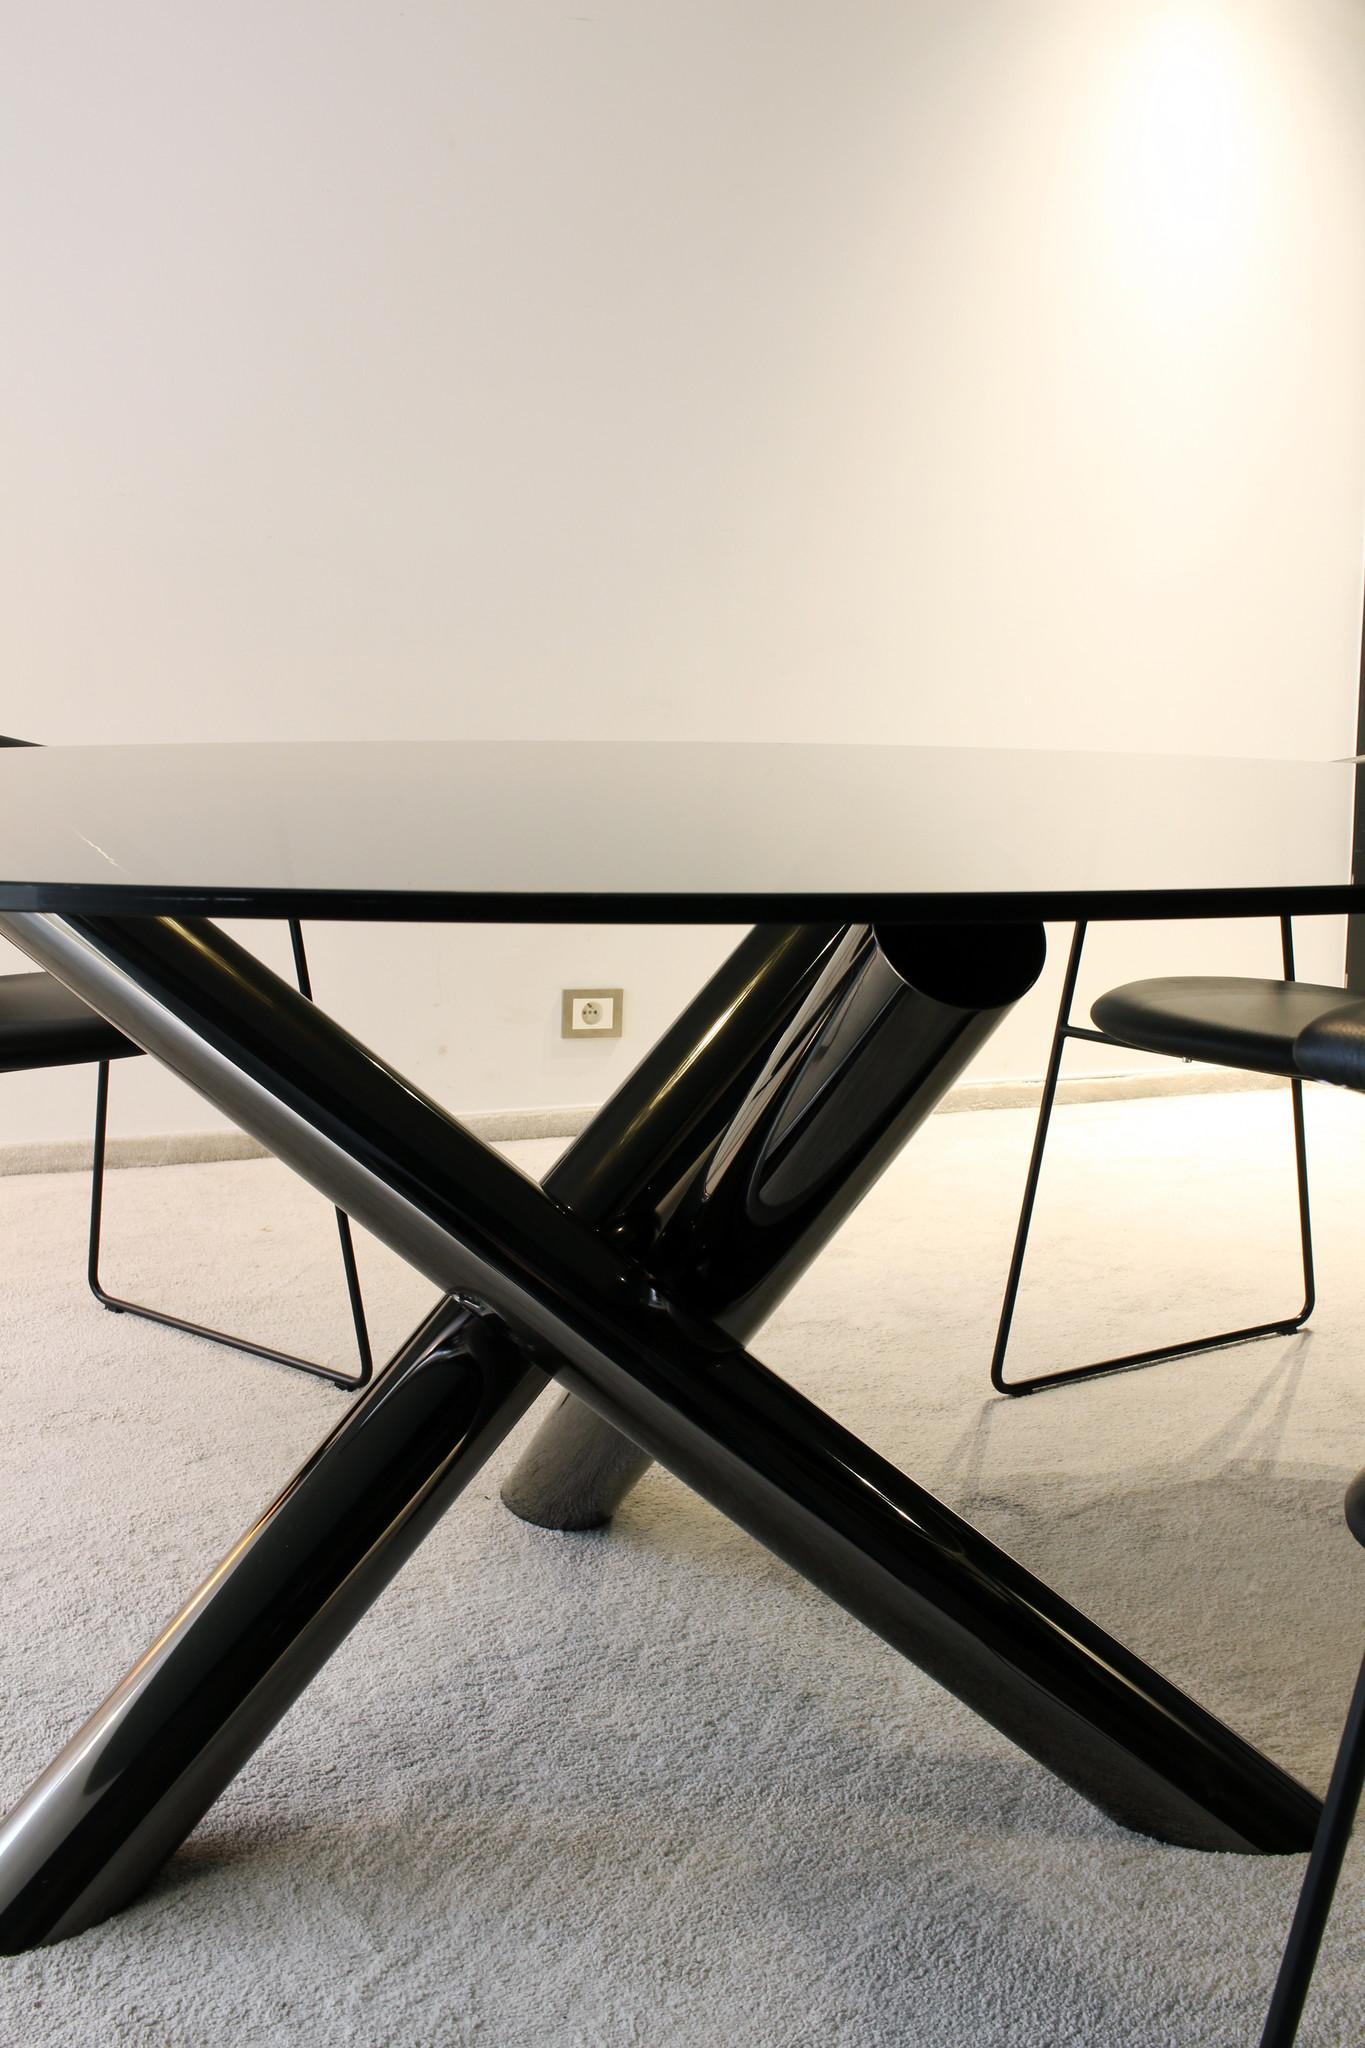 Van Dyck table by Rodolfo Dordoni for Minotti